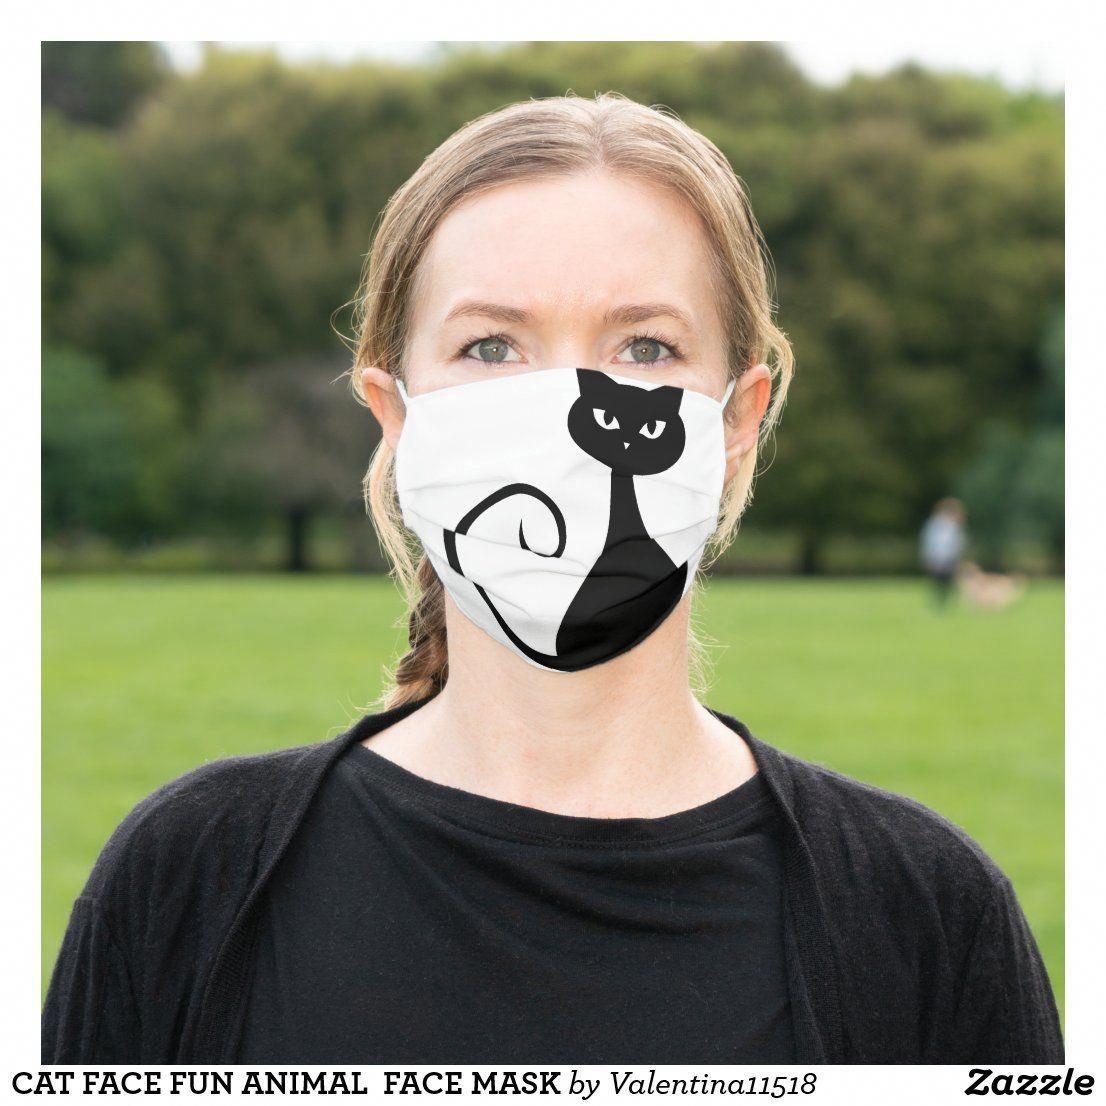 n95 face masks on amazon uk in 2020 Animal face mask